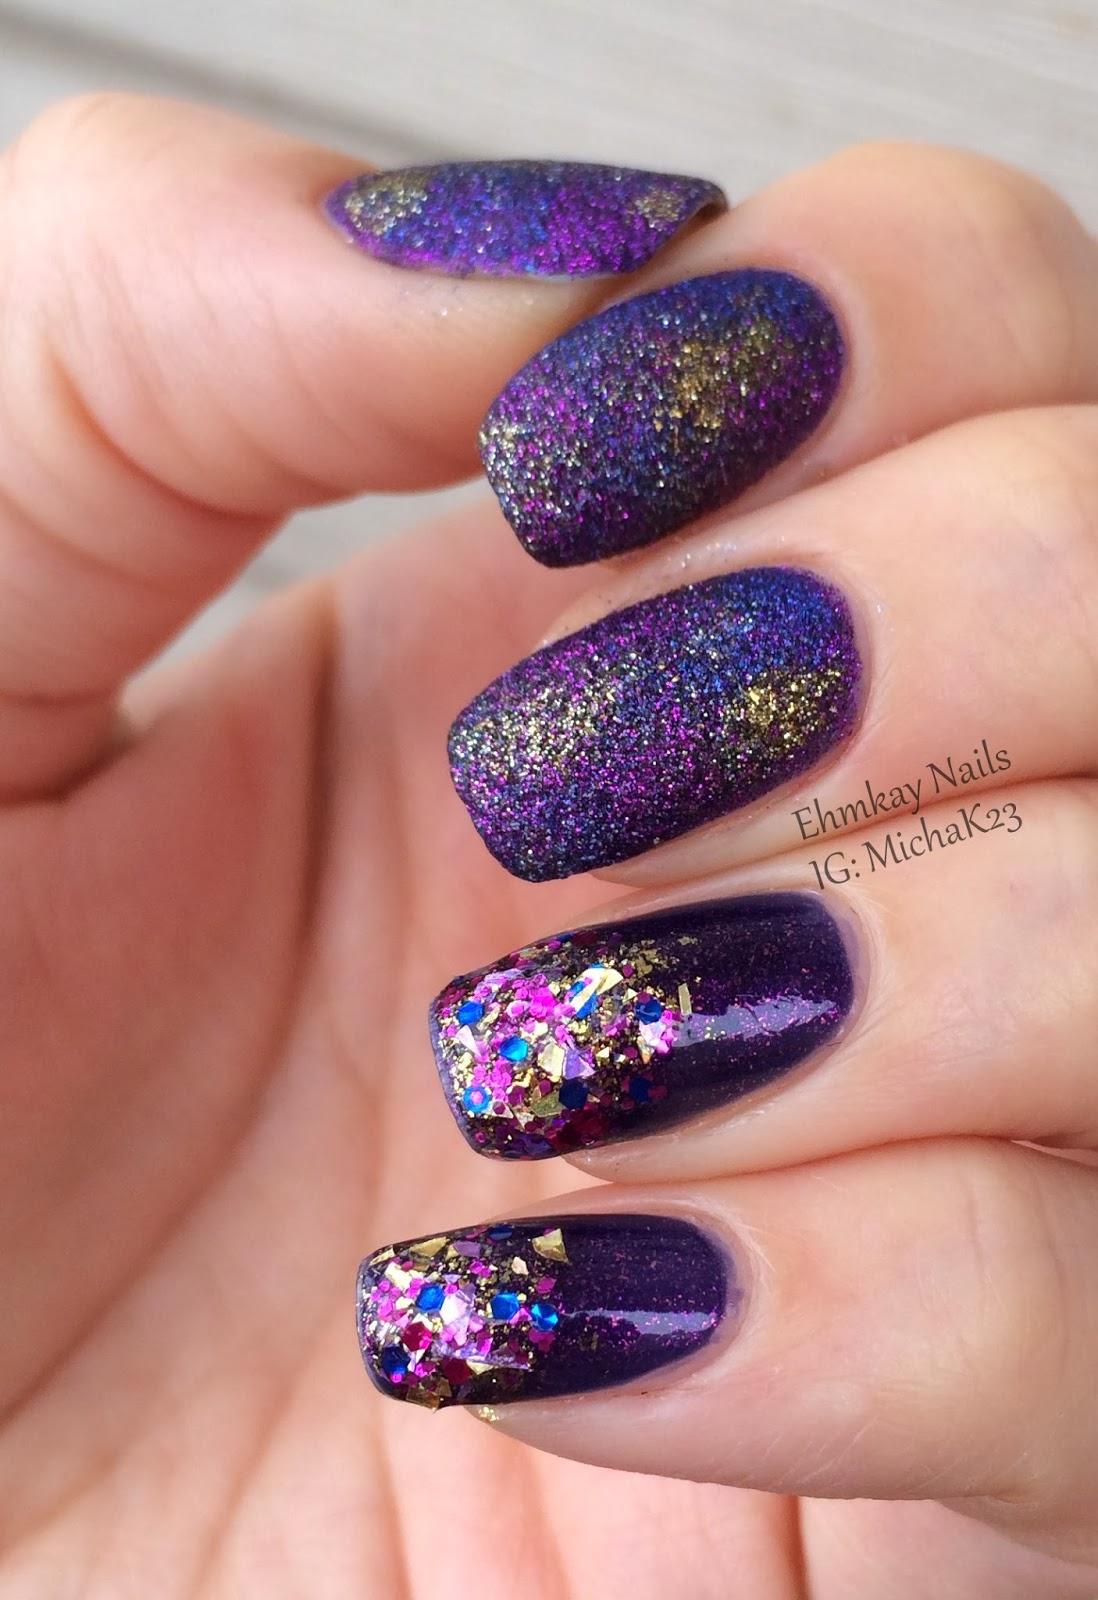 Ehmkay Nails: Texture Saran Wrap And Glitter Gradient Manicure